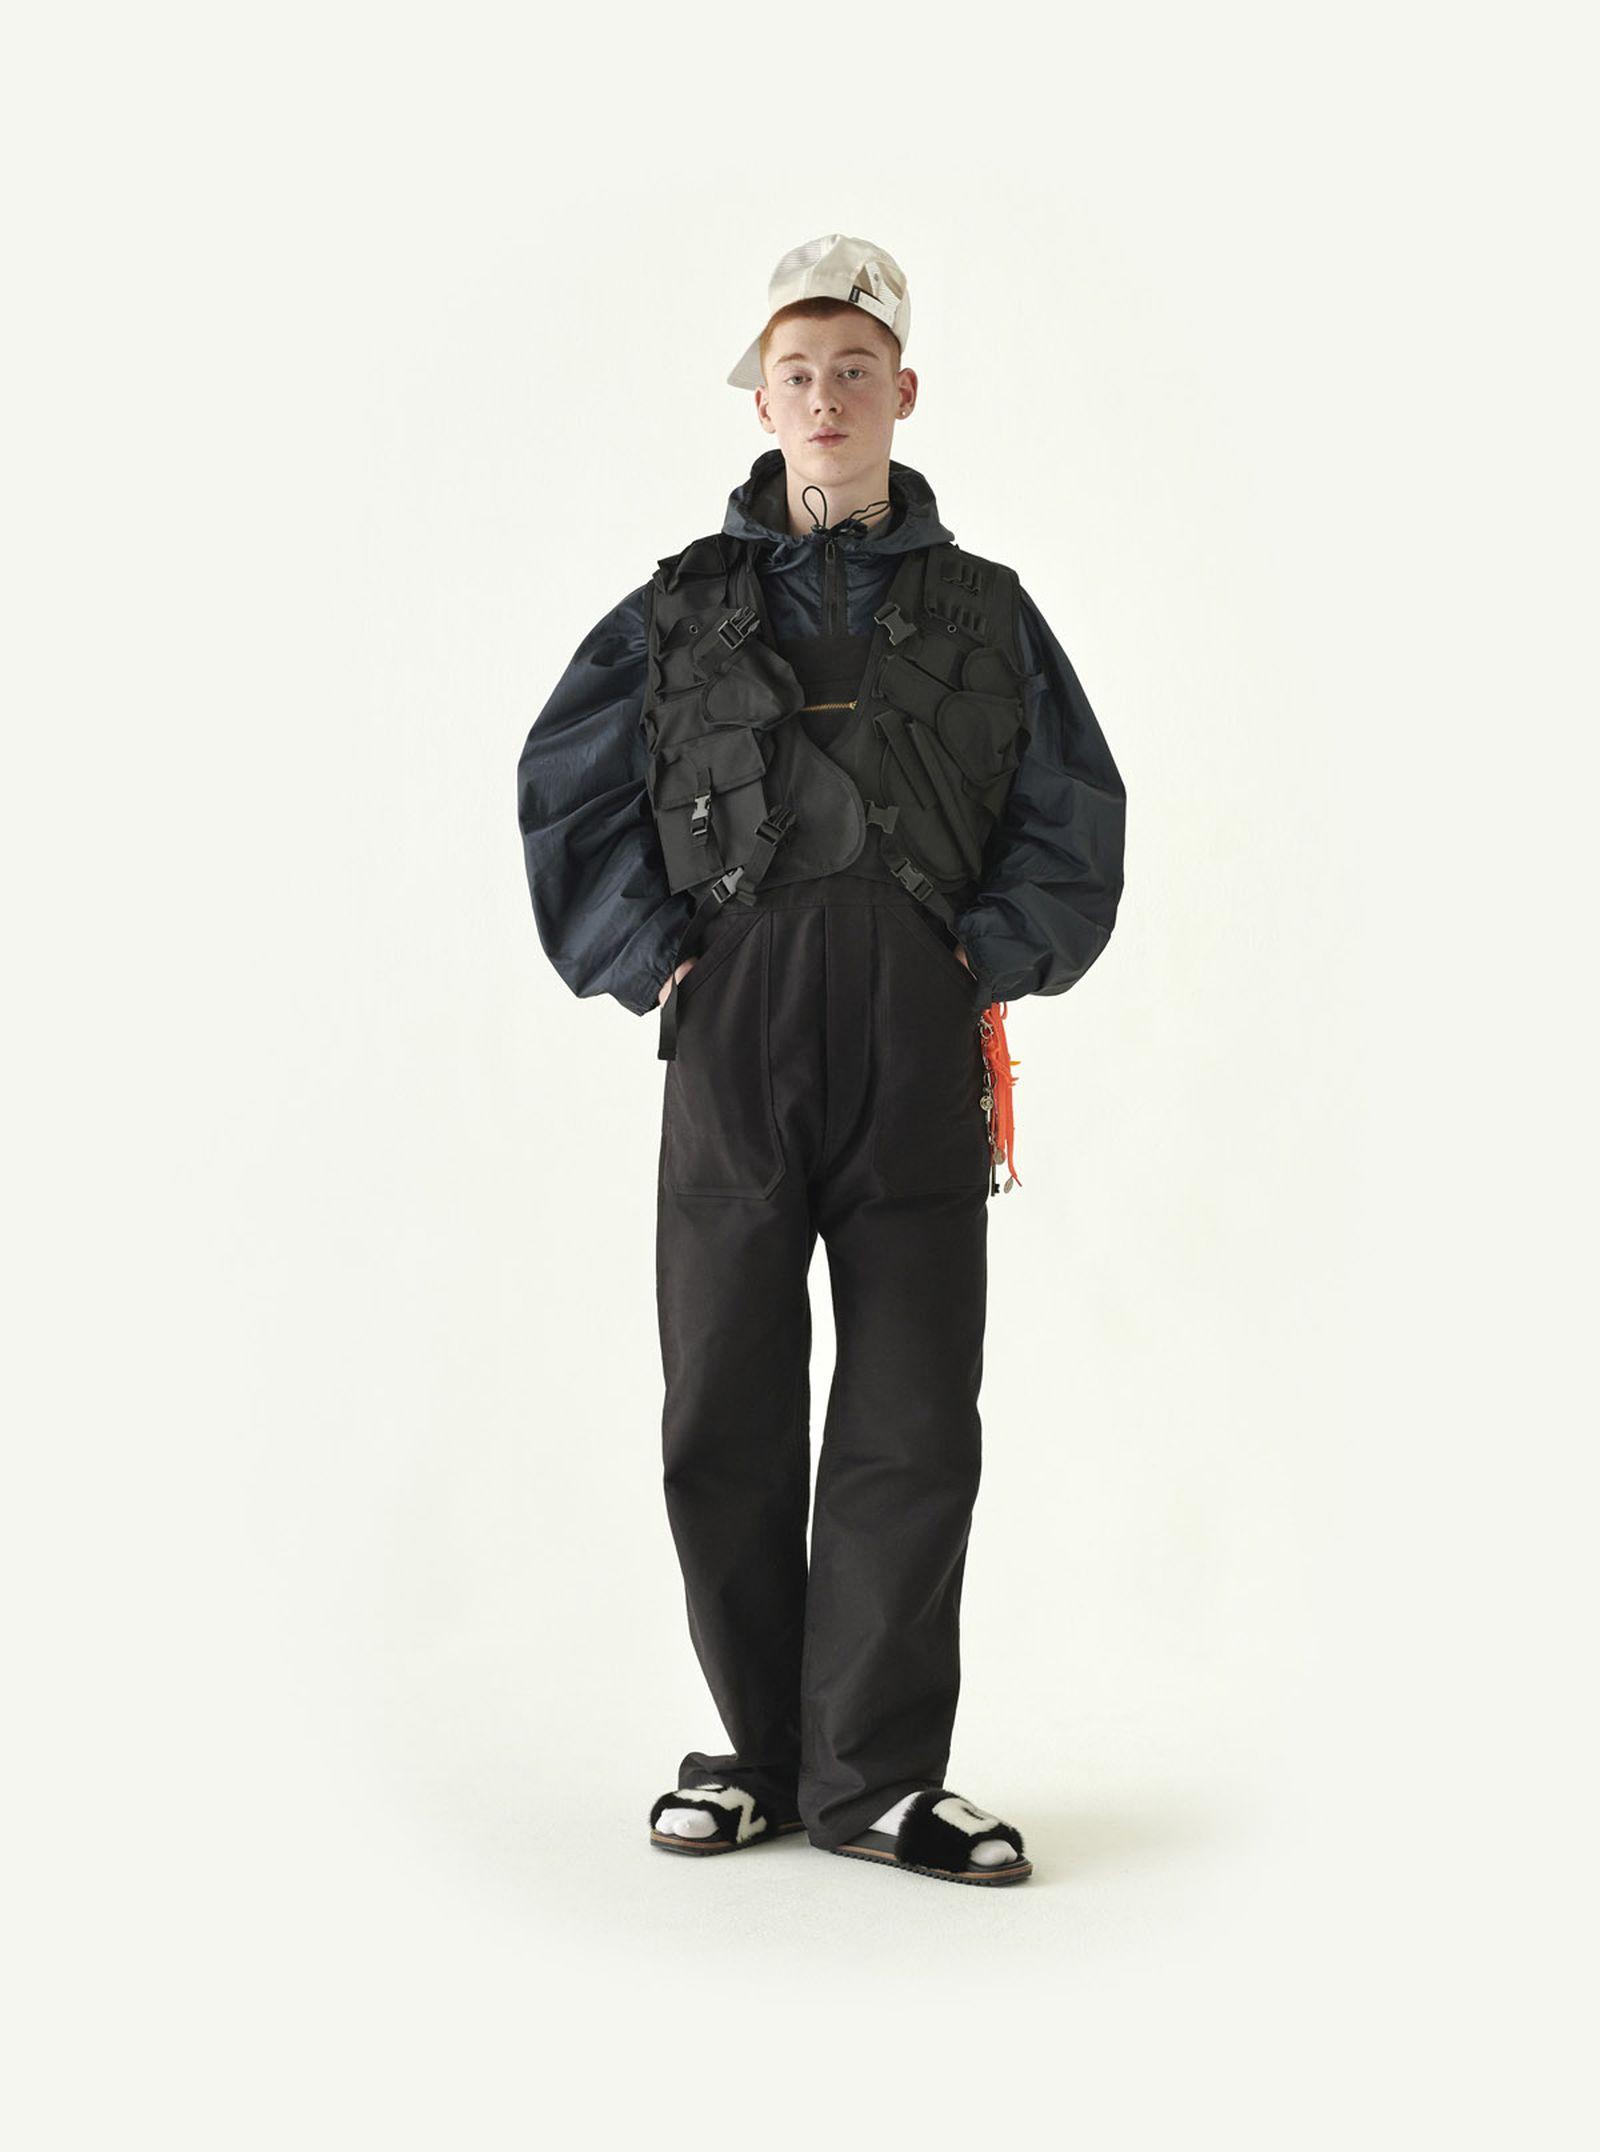 dressing-up-04